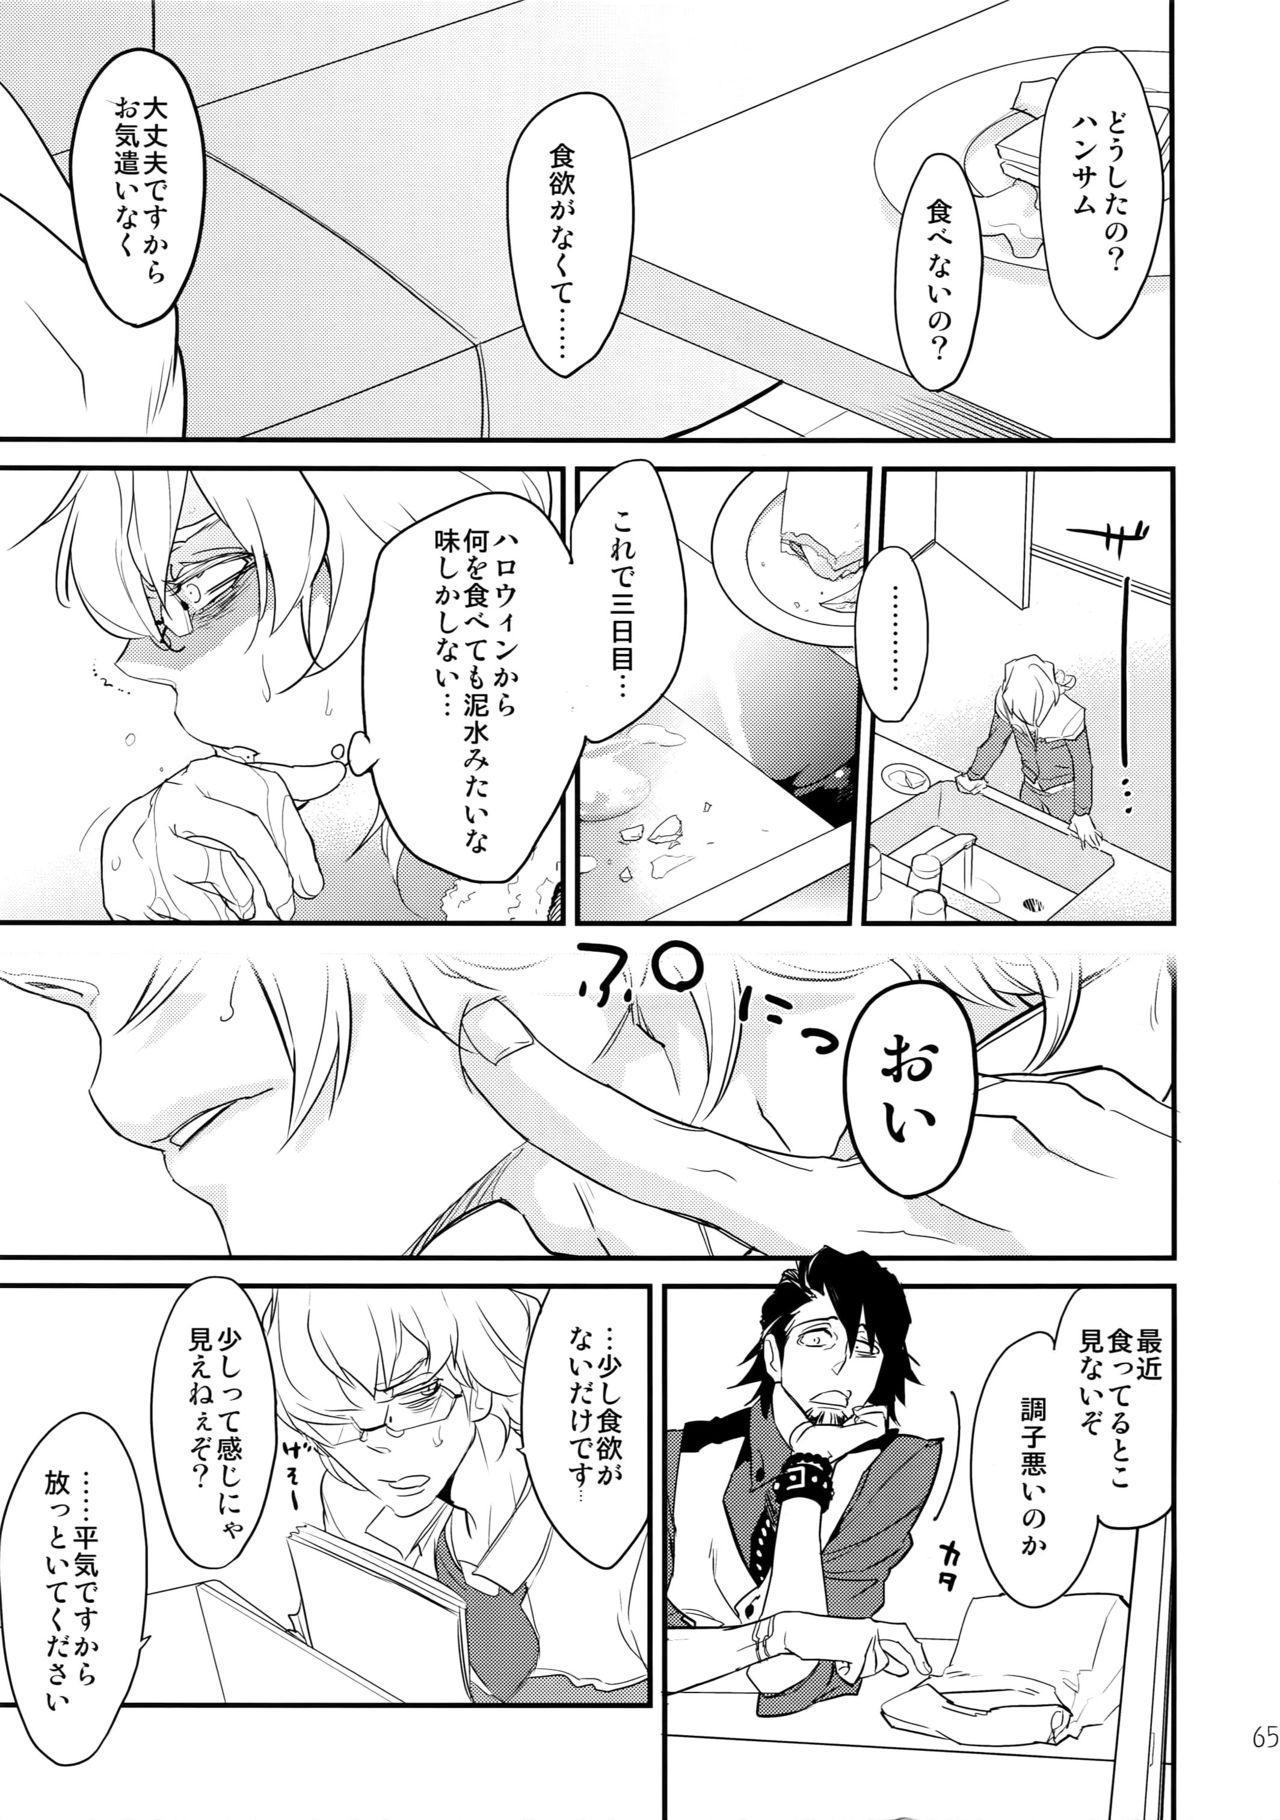 T&B Sairoku! 2 63